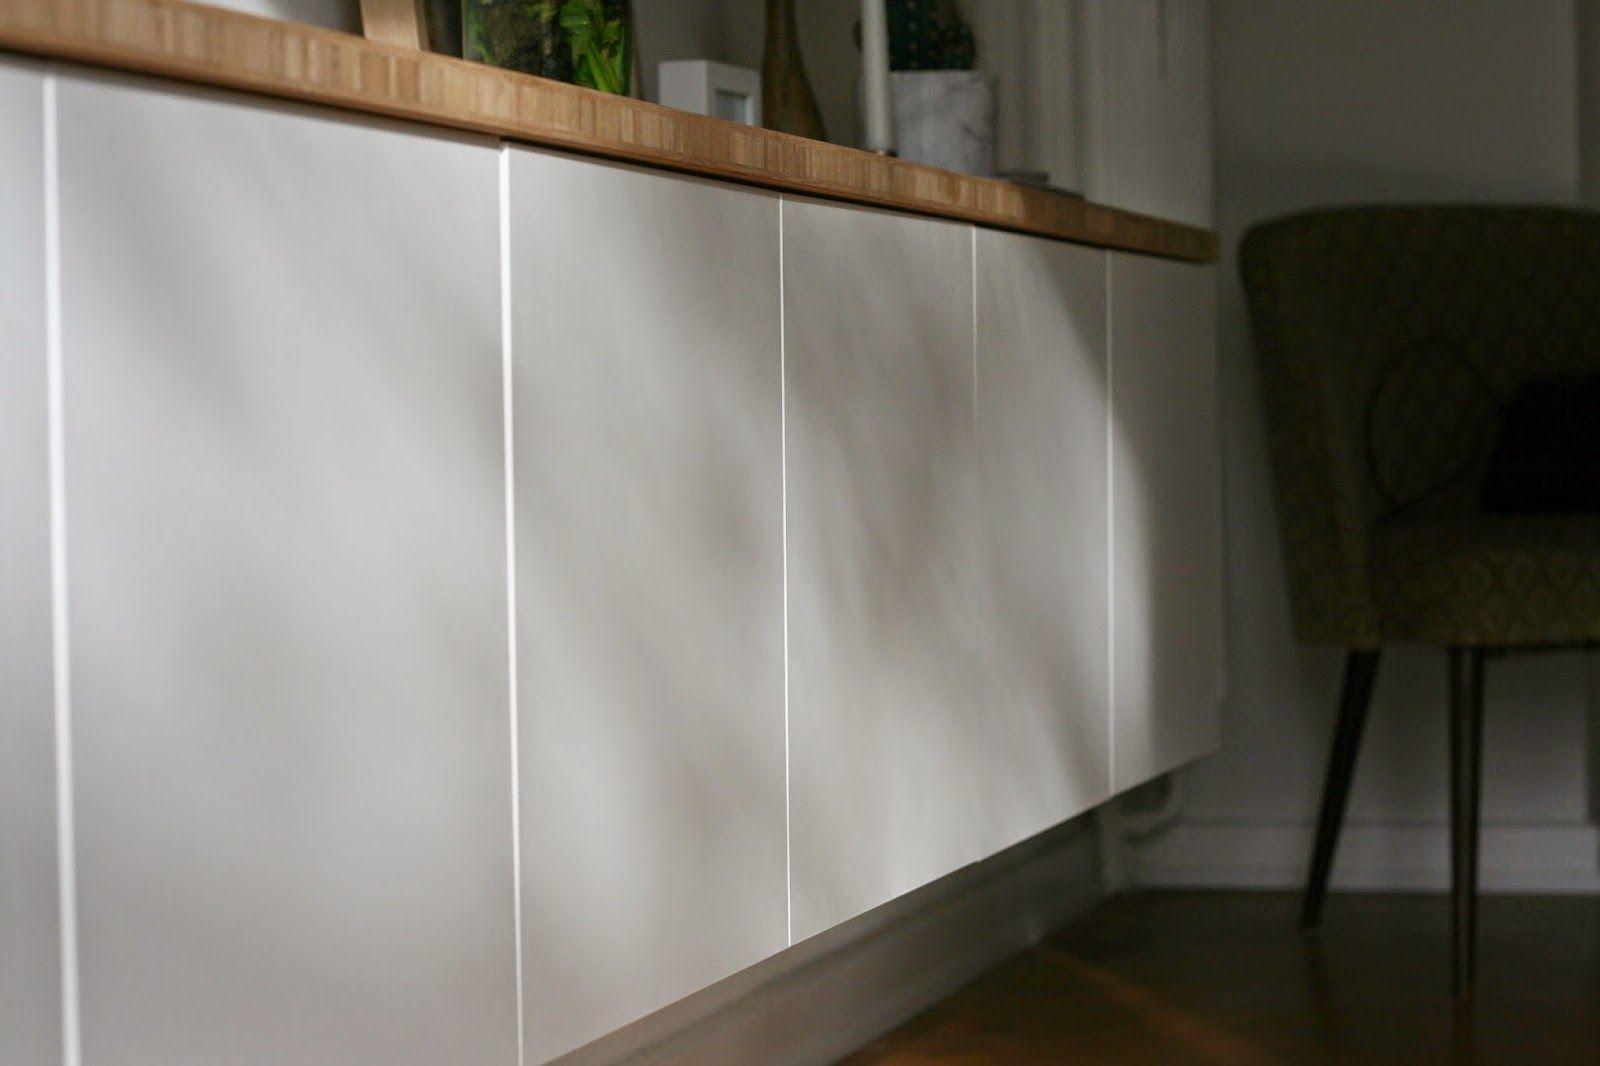 Schuhkasten Ikea ~ Projekt schuhschrank ikea ps wandverkleidung ohne print